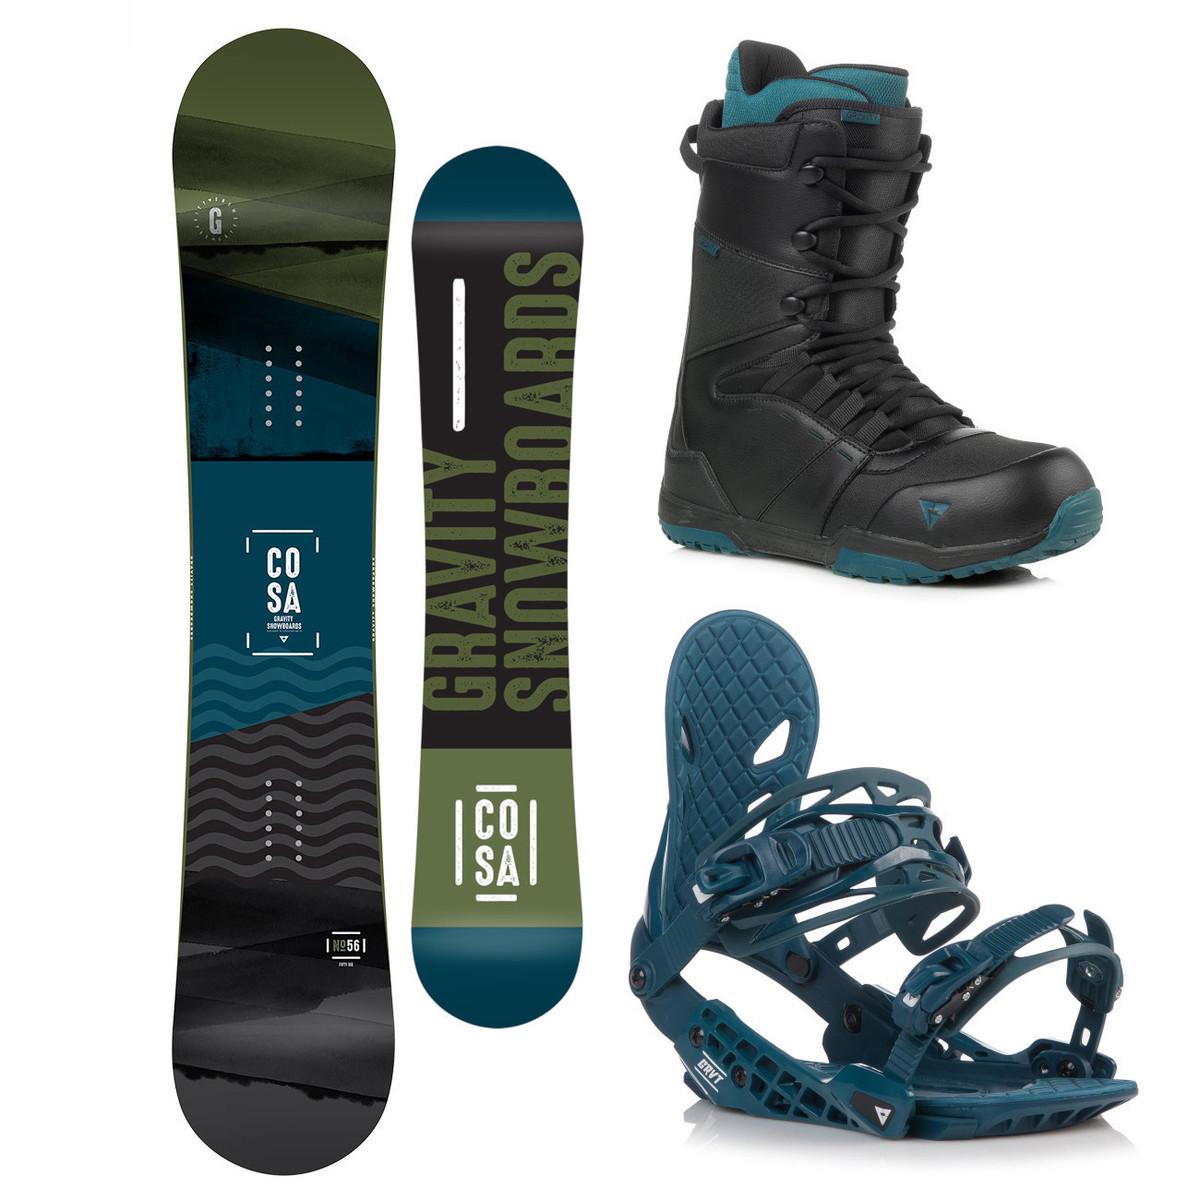 Snowboardový komplet Gravity Cosa 18/19 L (EU 42-48) 168W